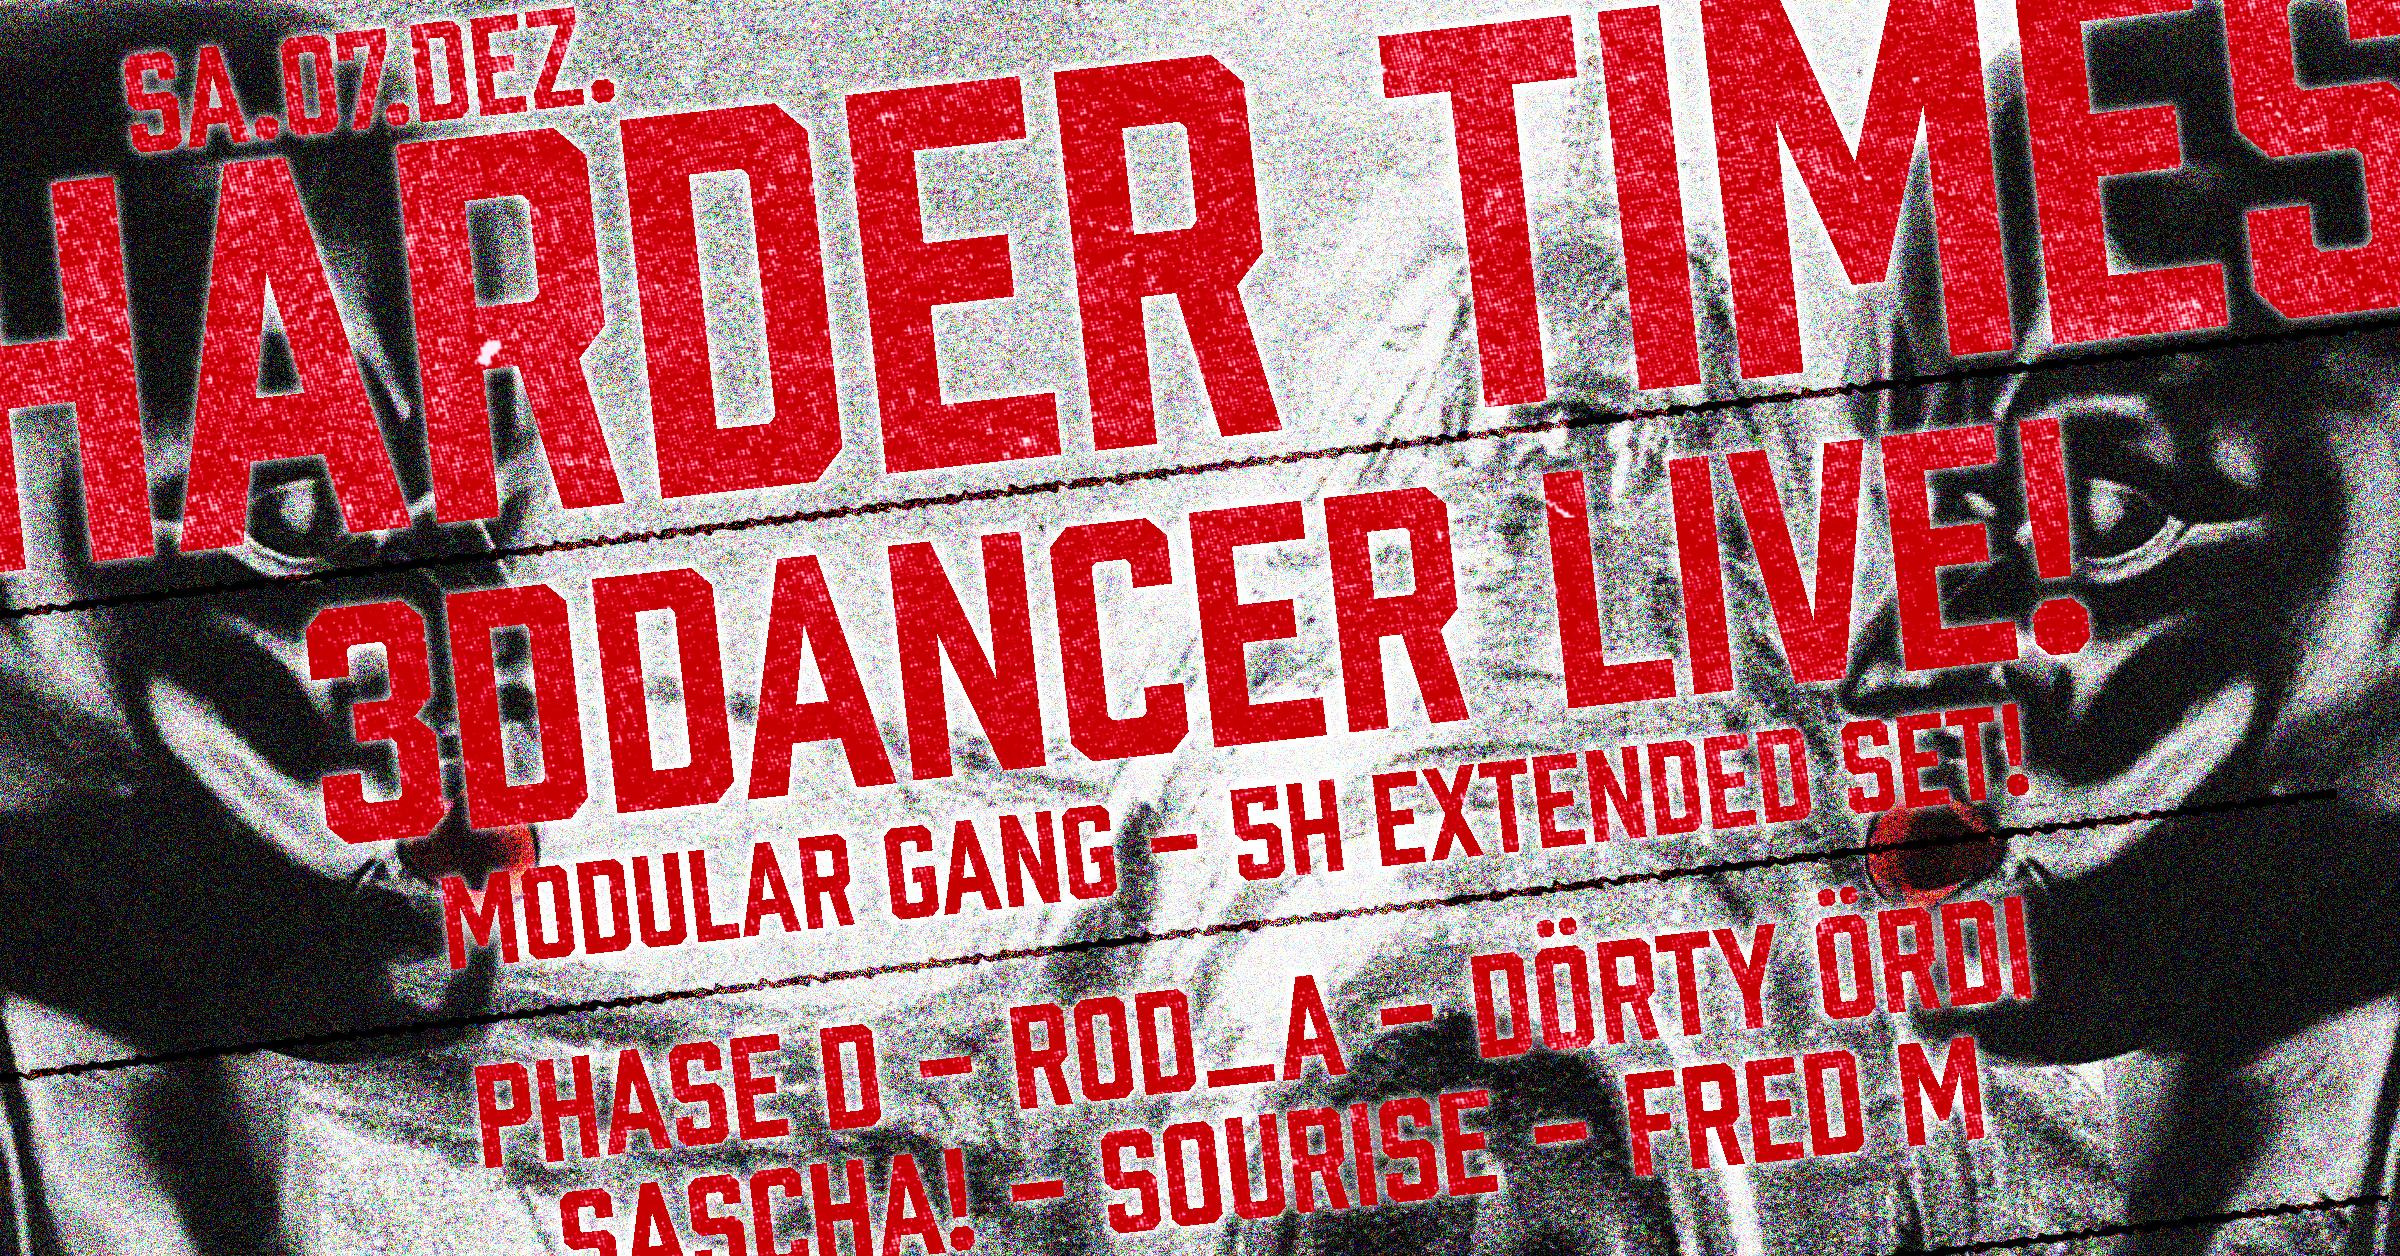 Harder Times - 3Ddancer >5h live Wahnsinn!